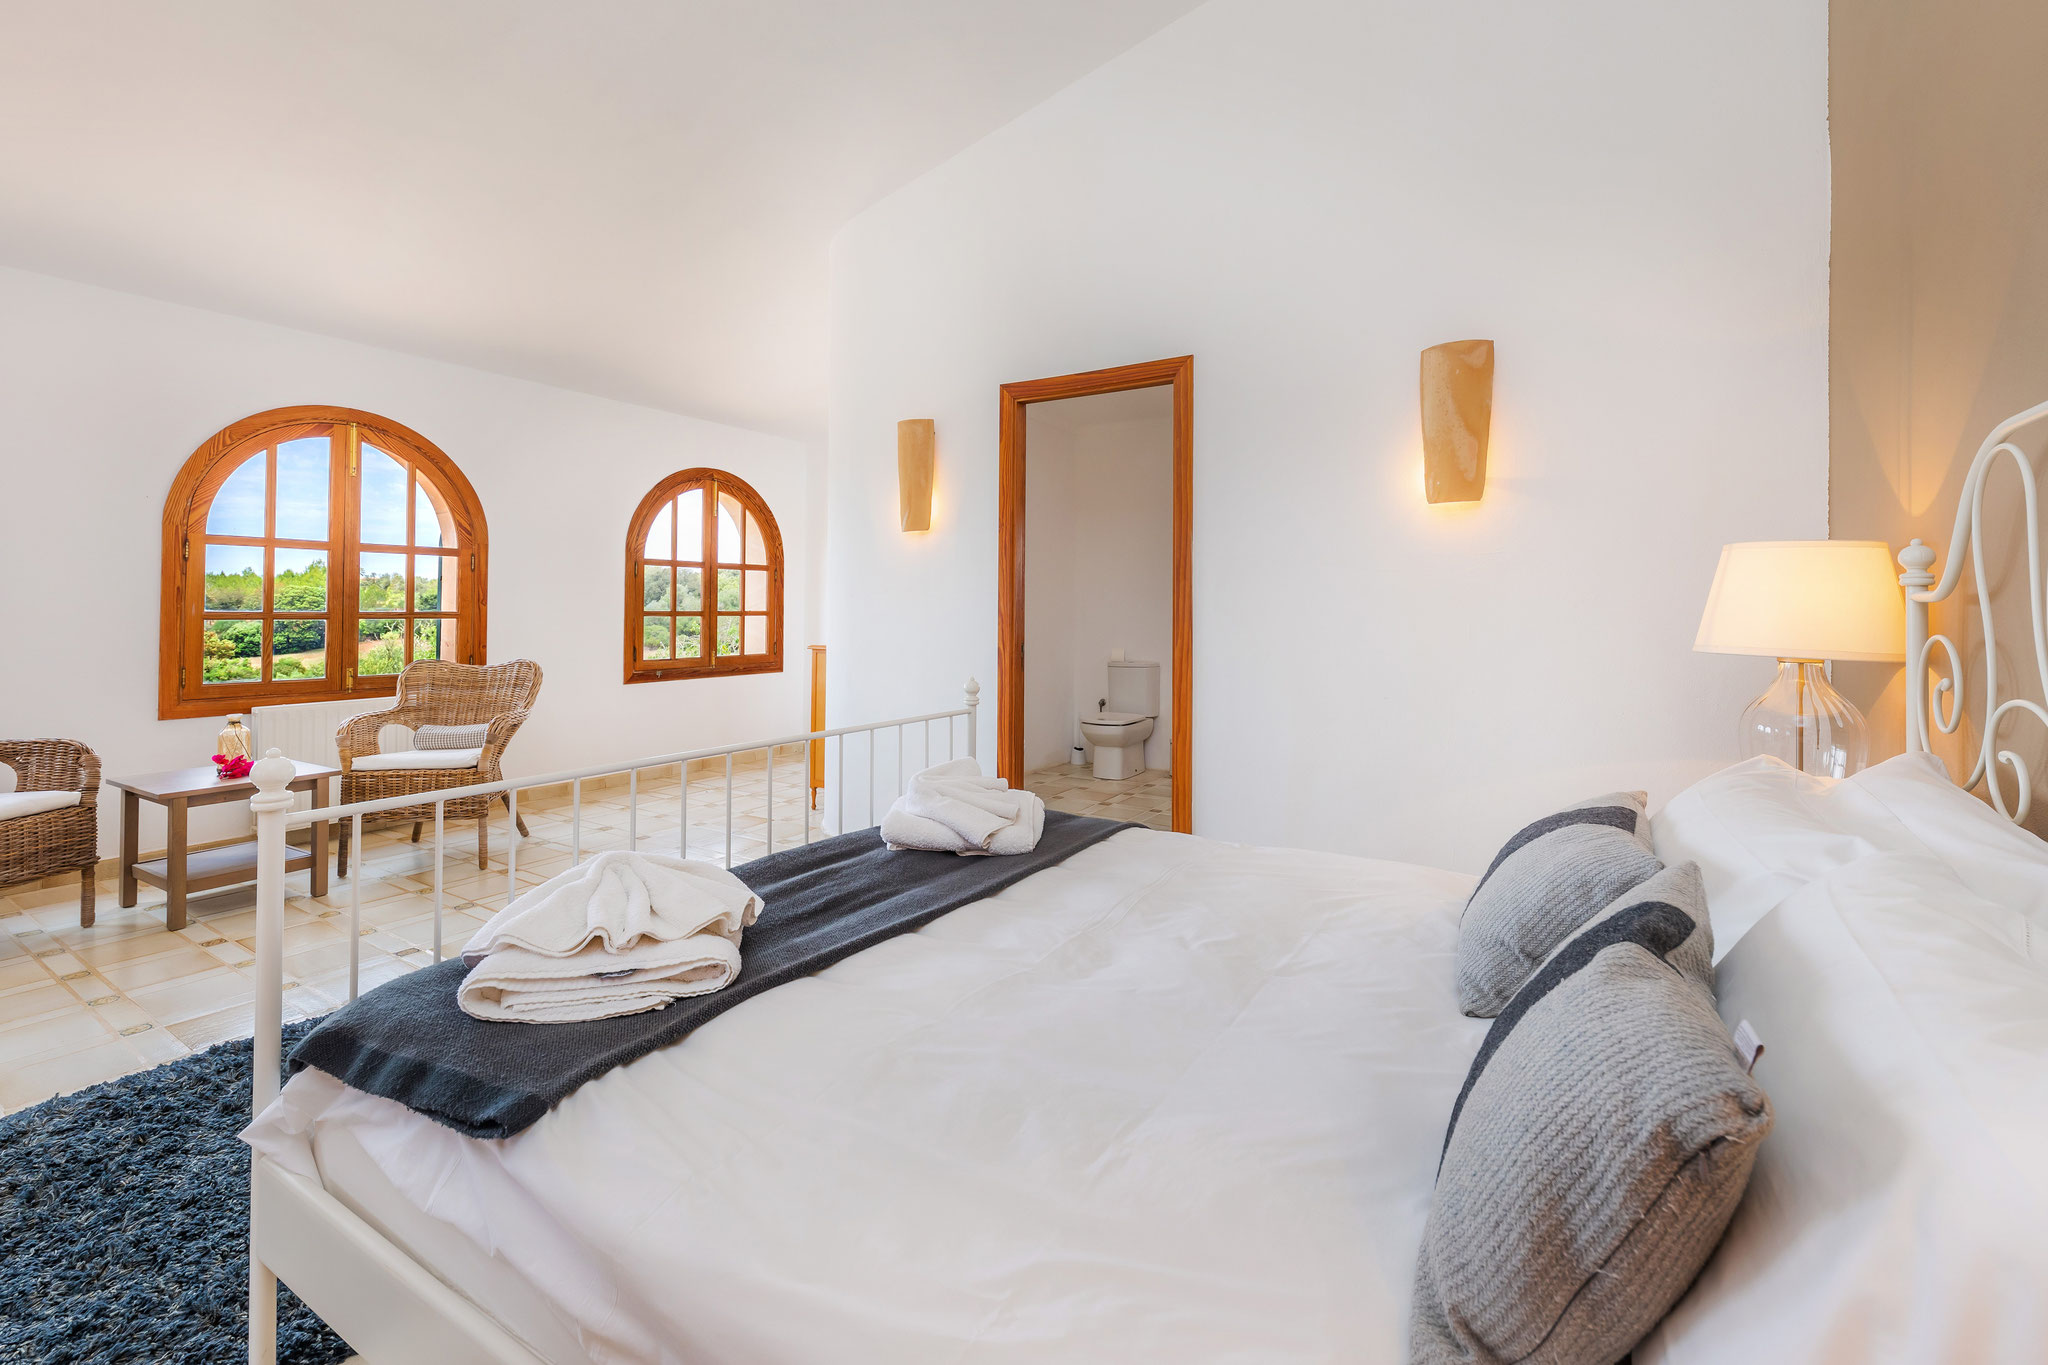 primera planta, dormitorio principal con cama doble kingsize